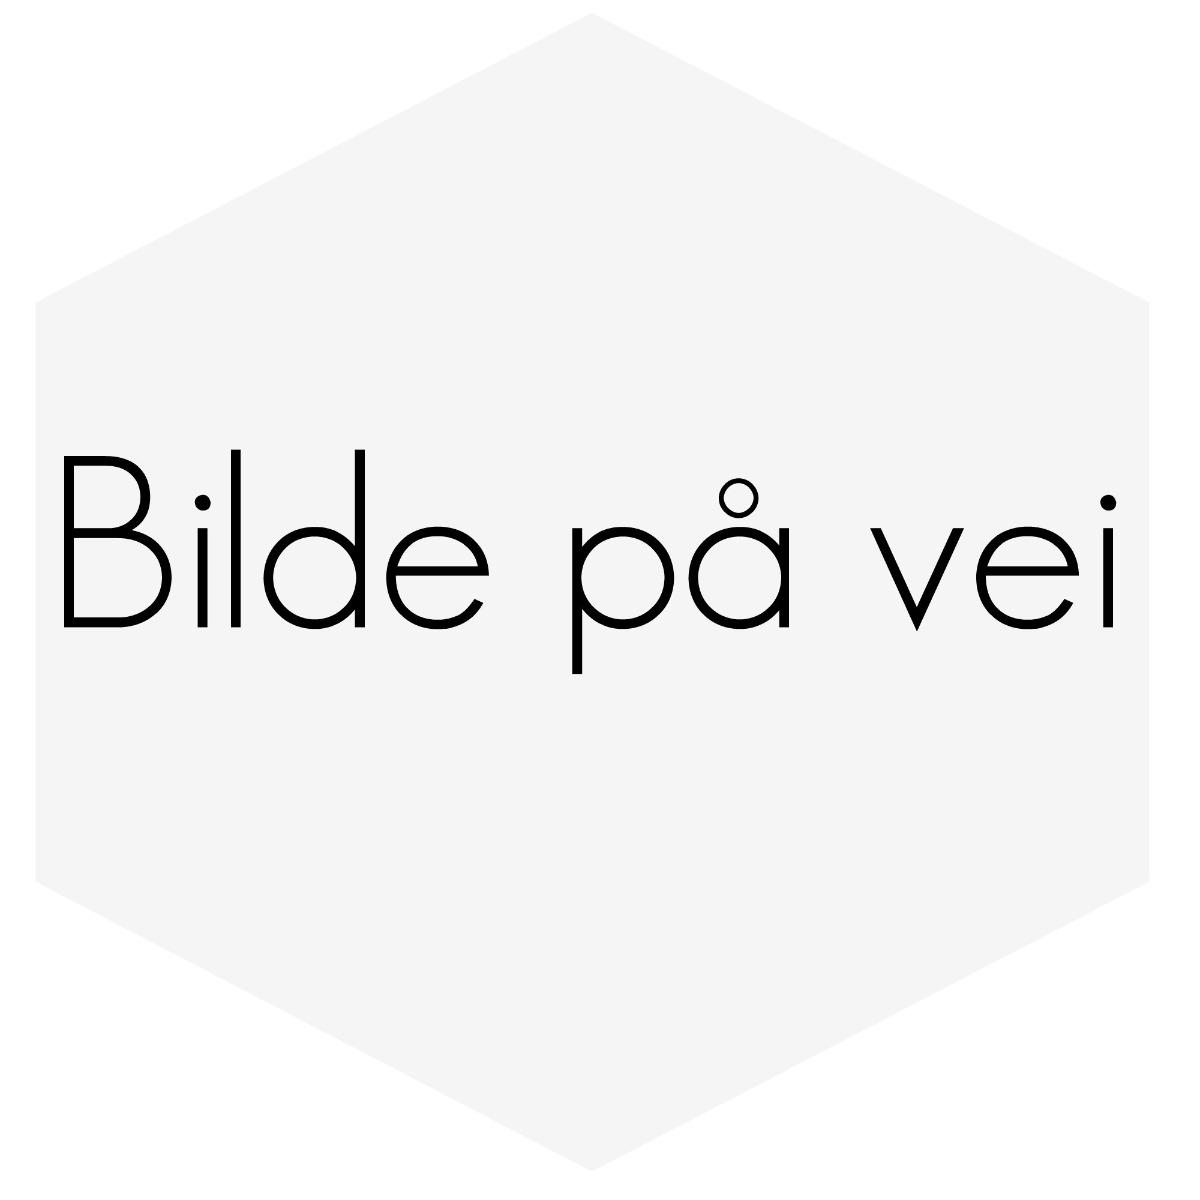 KLIPS DØRTREKK/PANEL AMAZON/P1800 ++FLERE    PRIS STK.